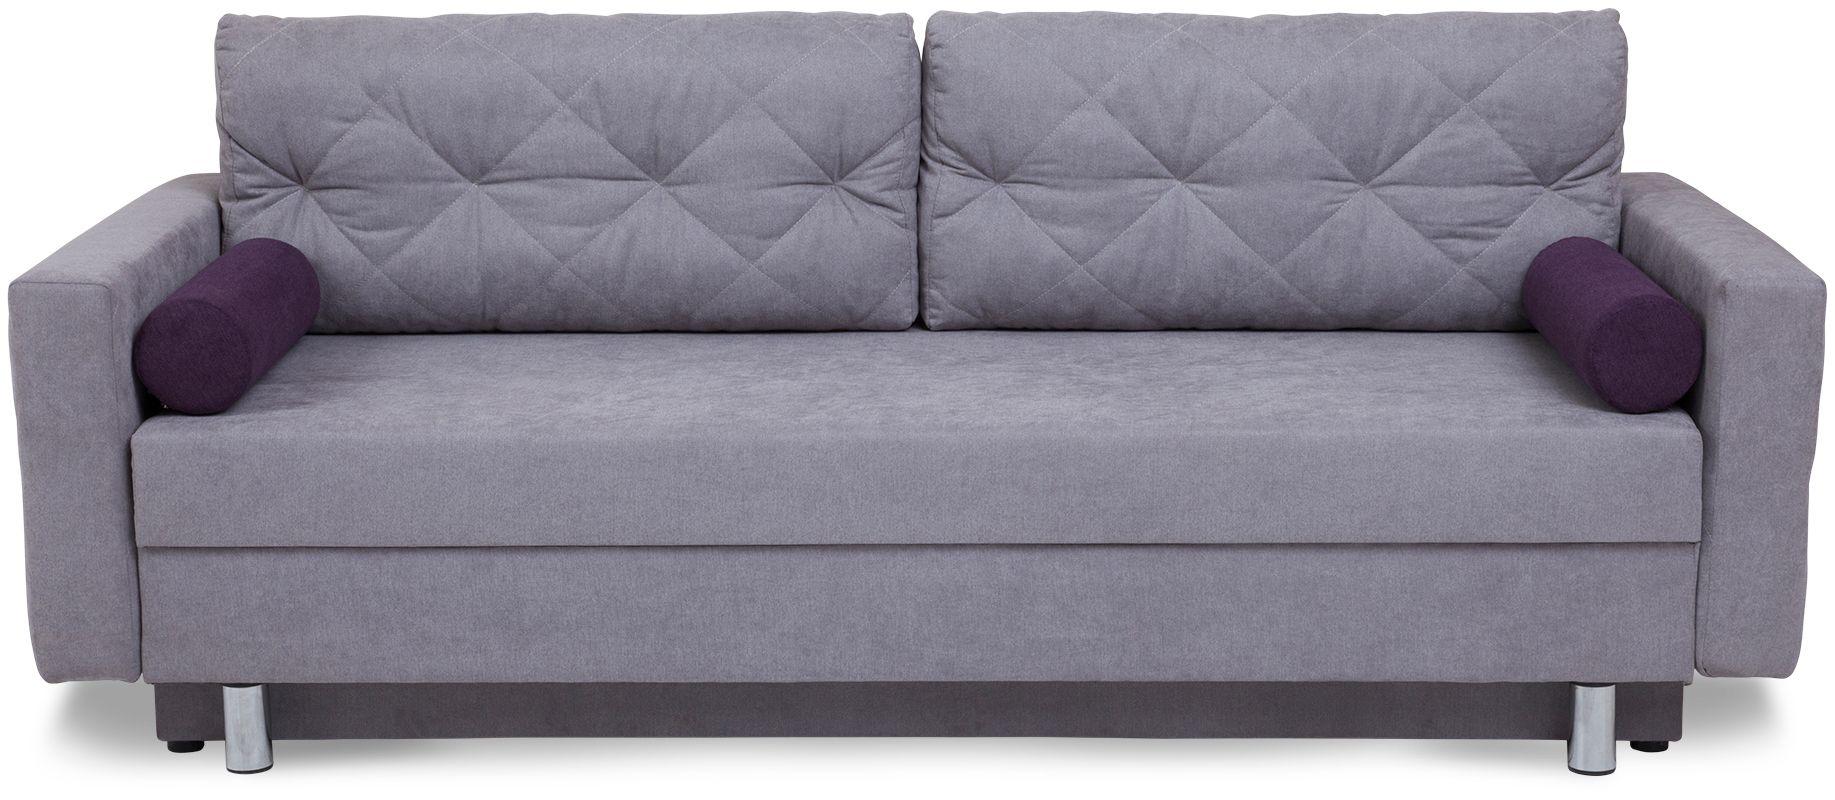 sofa alba 6